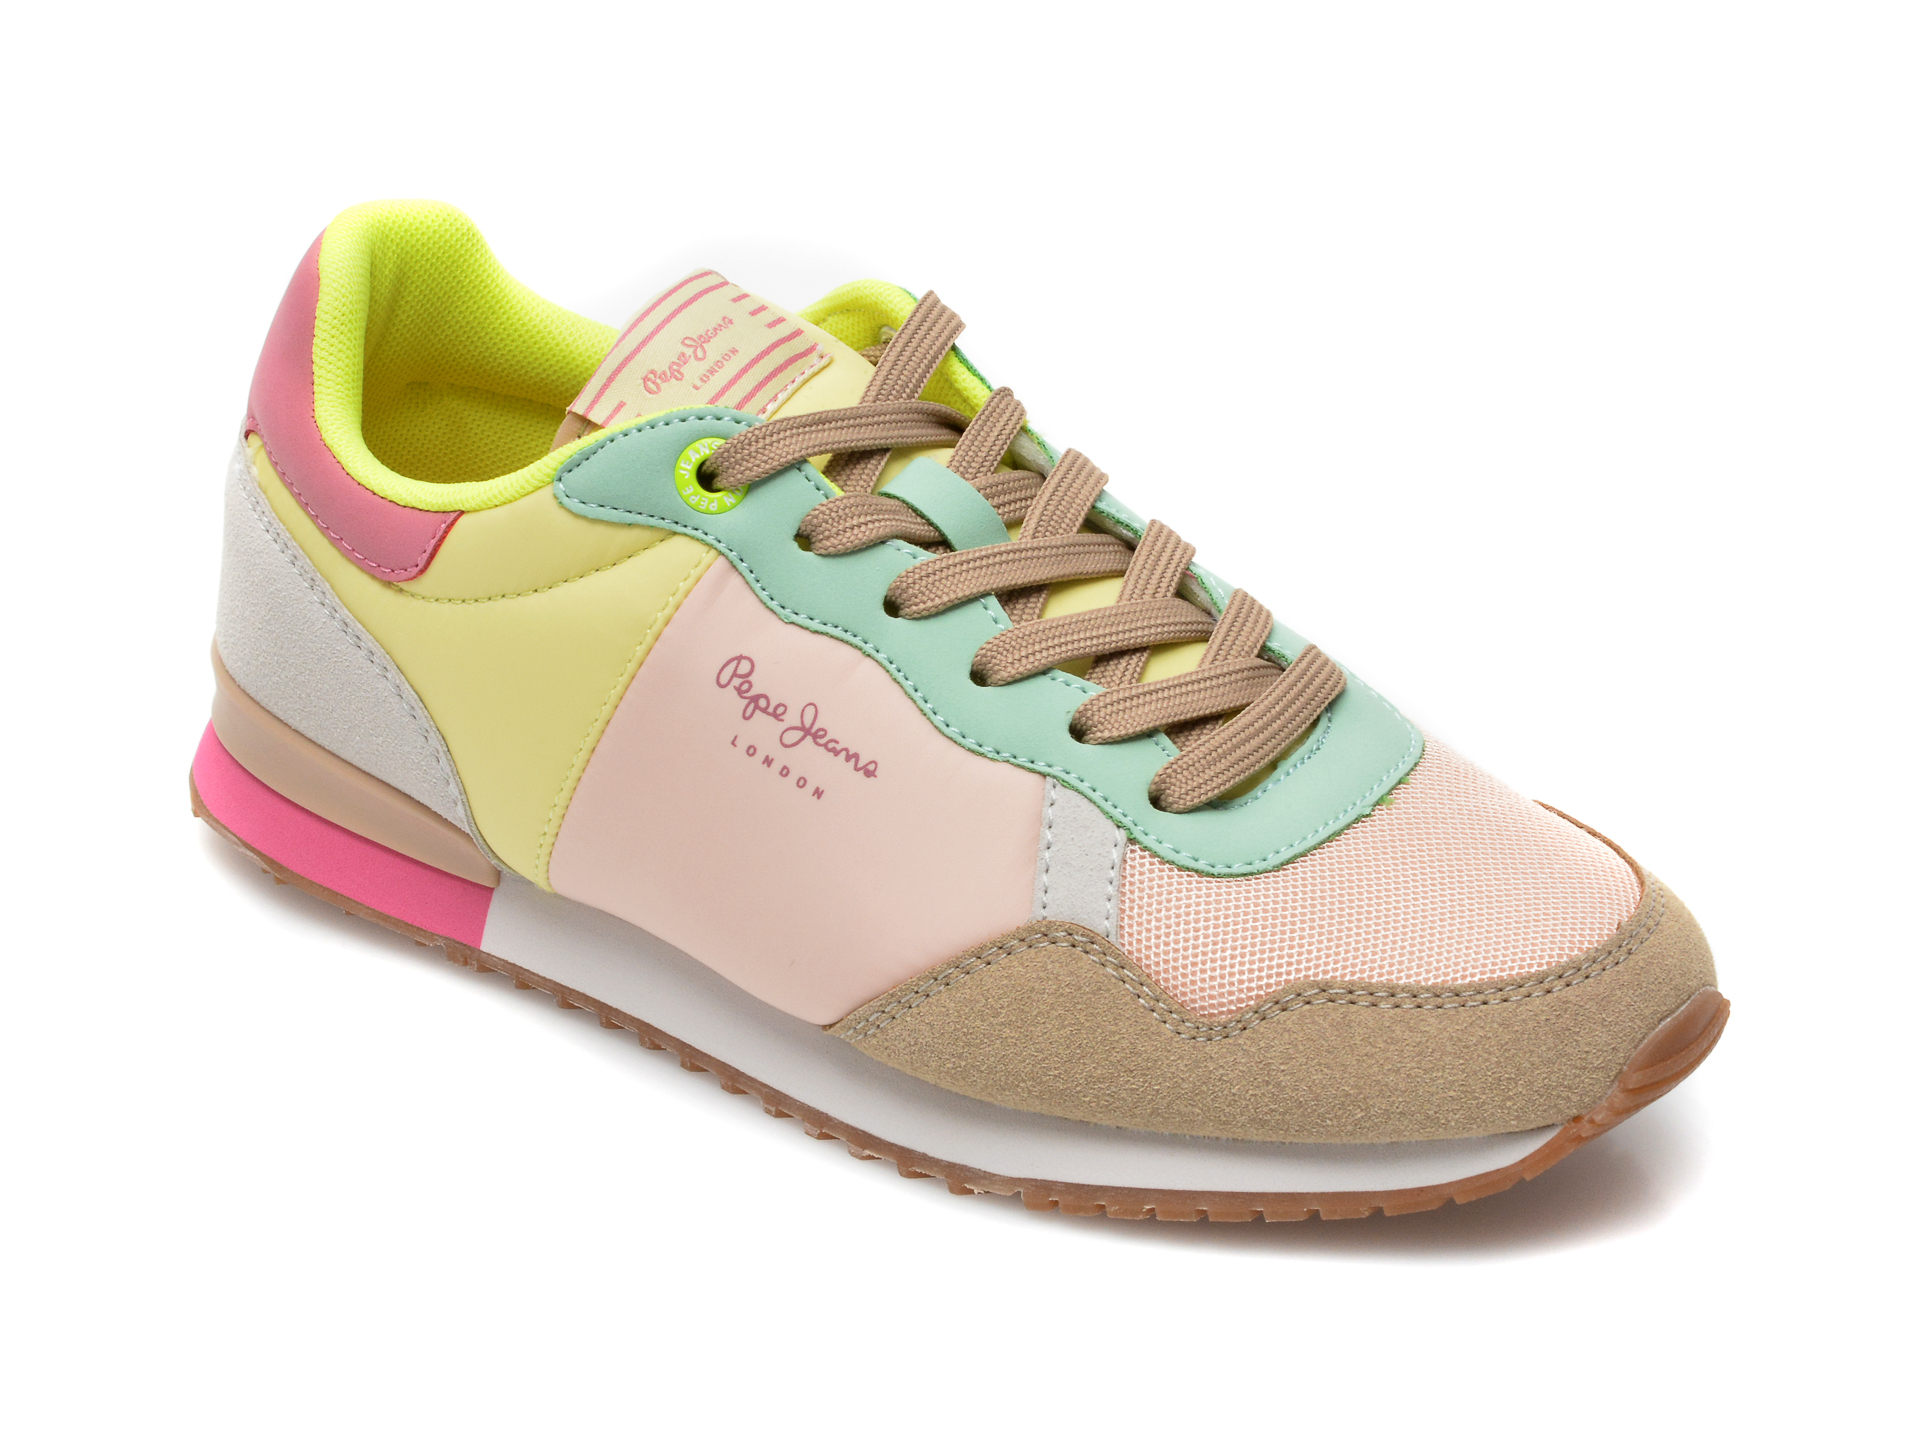 Pantofi sport PEPE JEANS multicolori, 3111099, din material textil si piele naturala imagine otter.ro